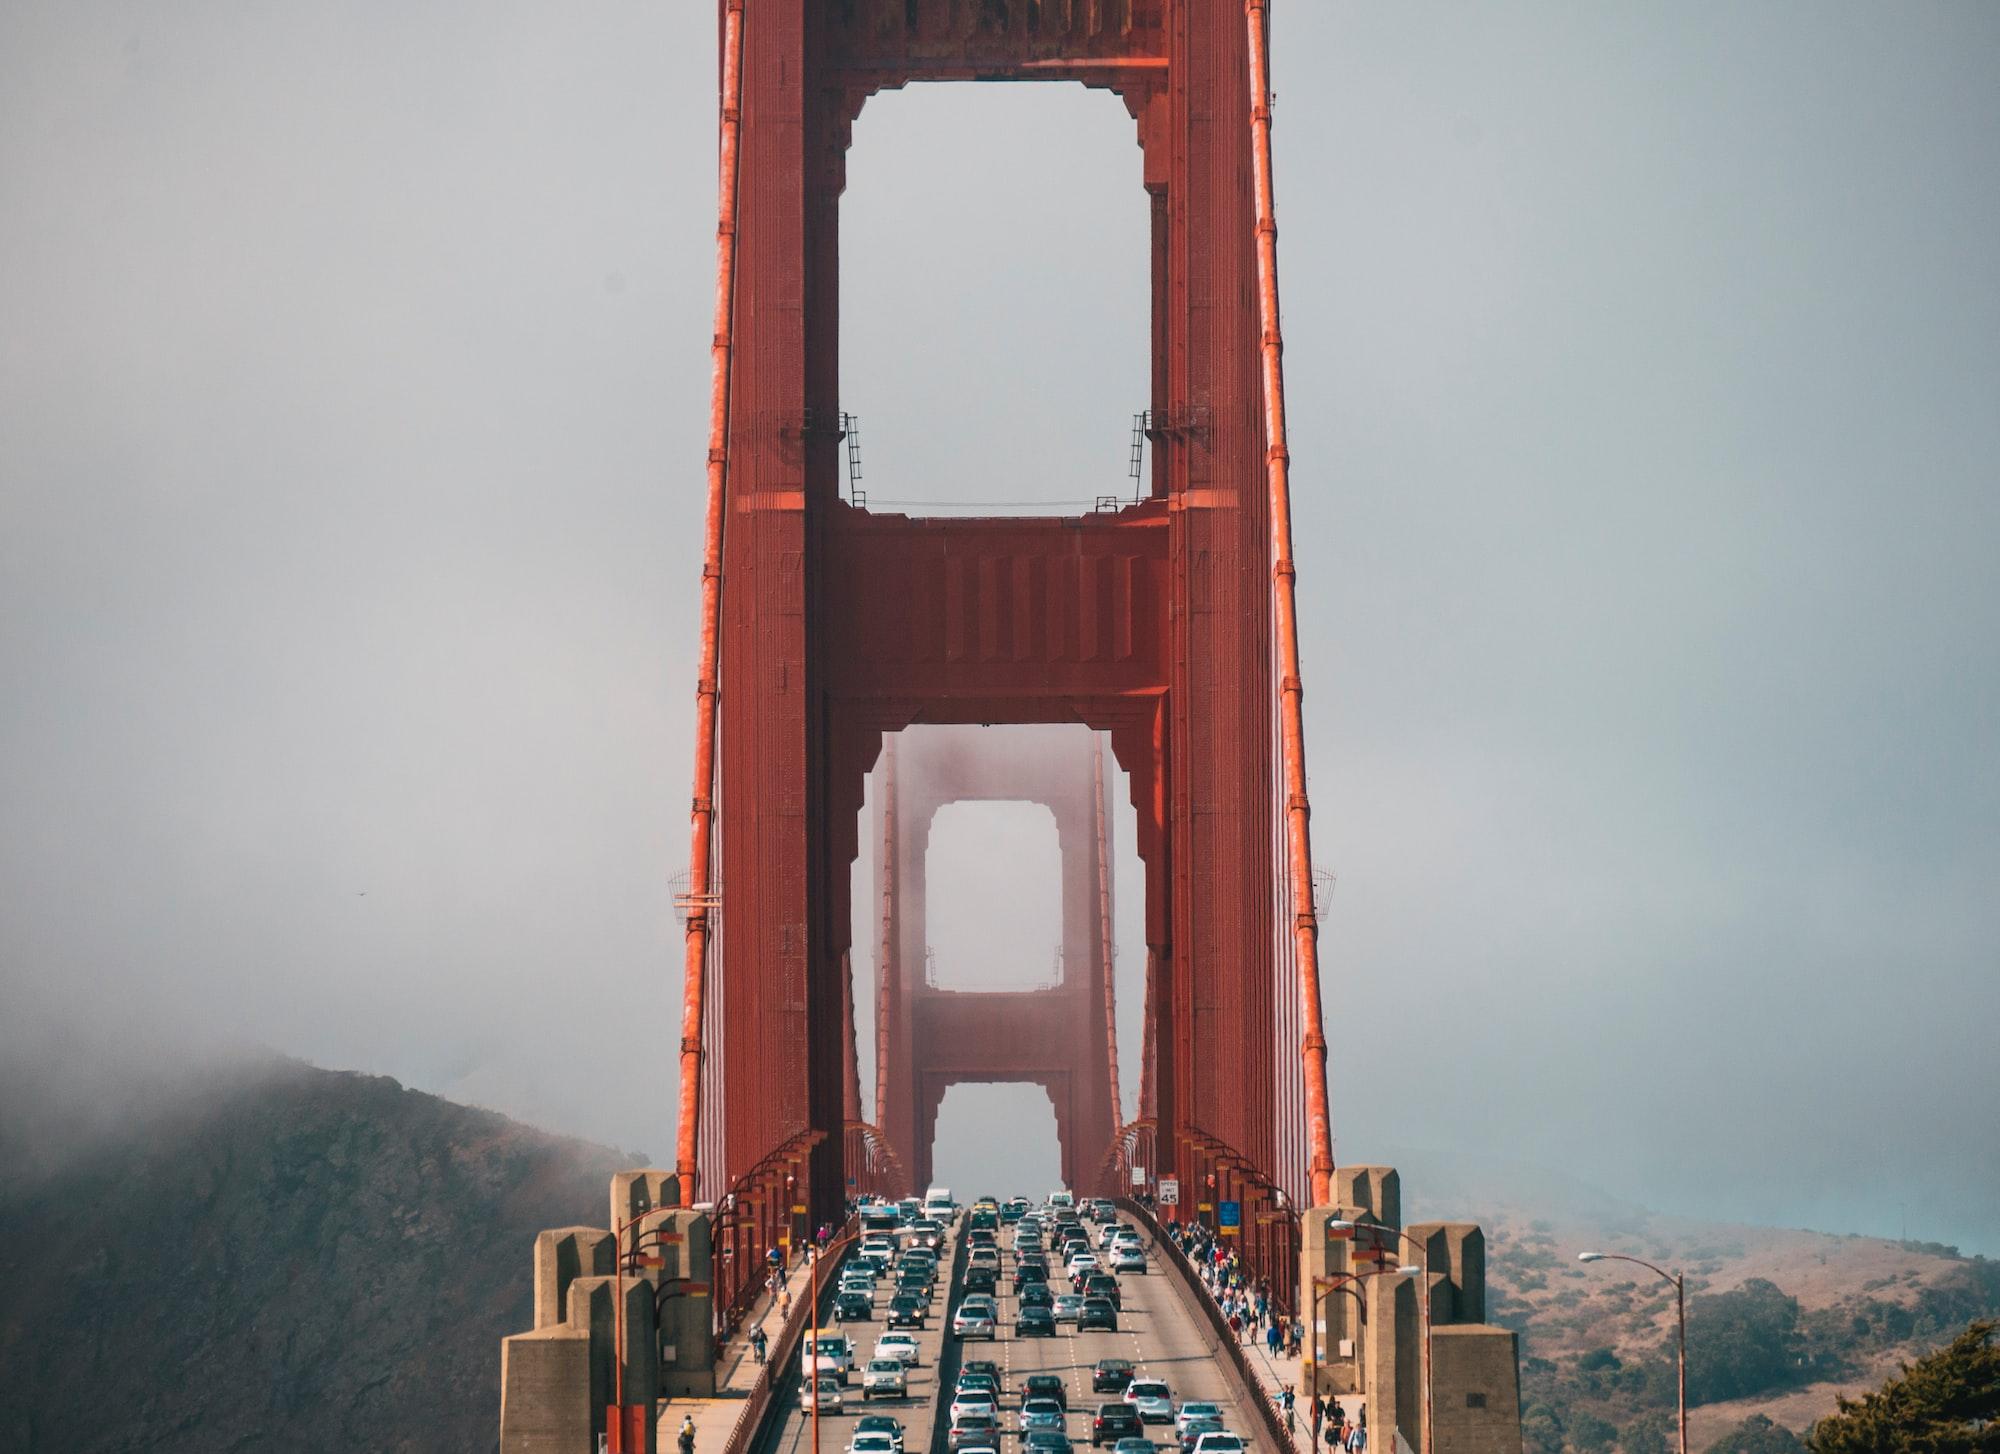 CHARLA: Secrets of Silicon Valley